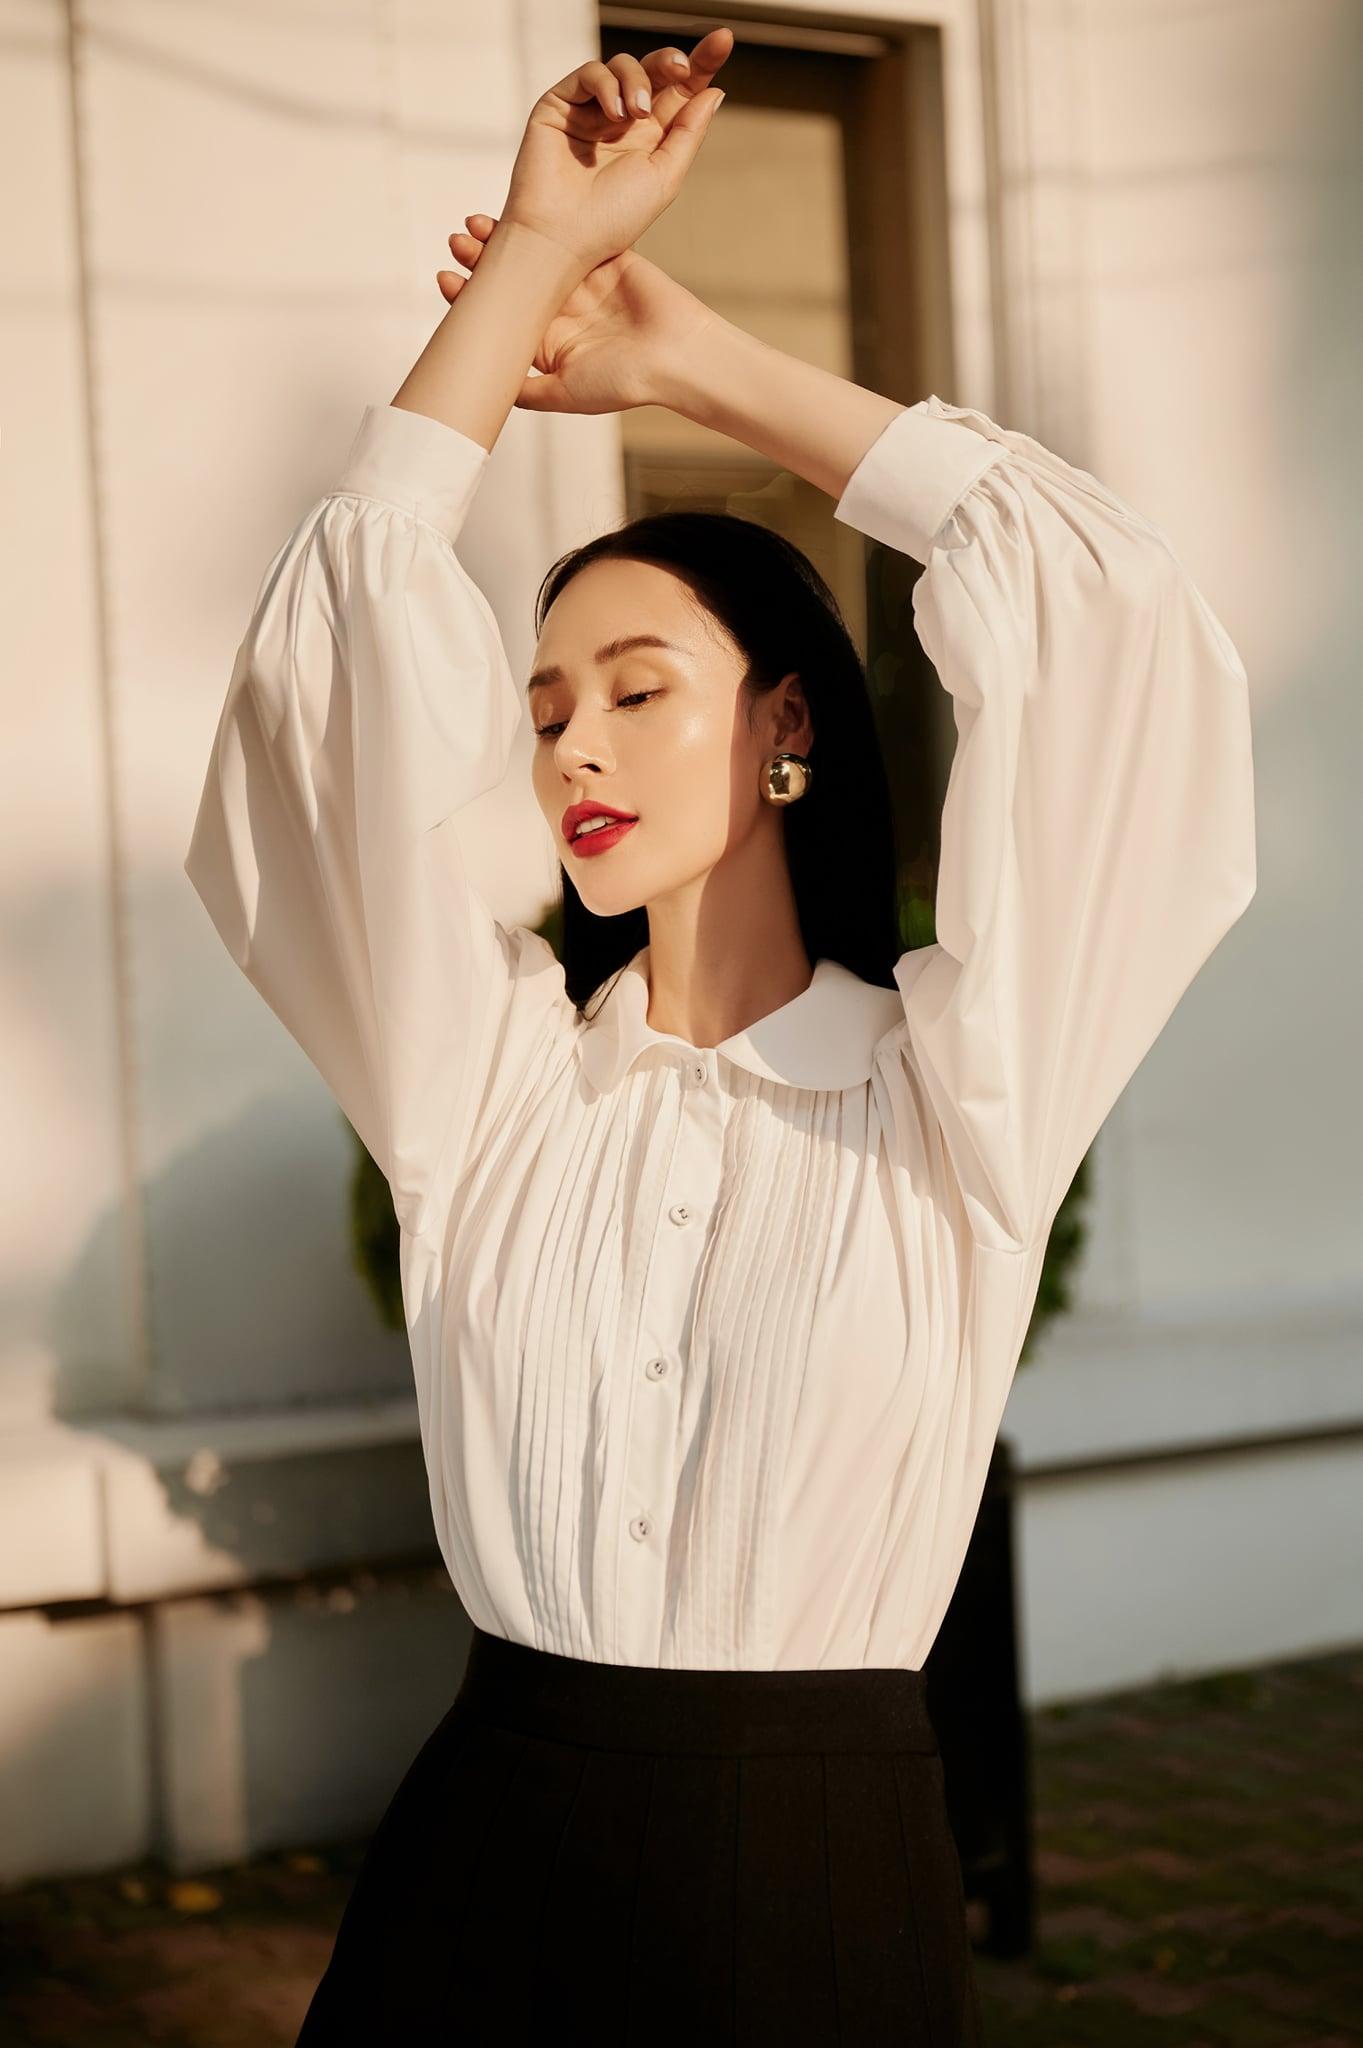 under-the-sunset-white-shirts-everyday